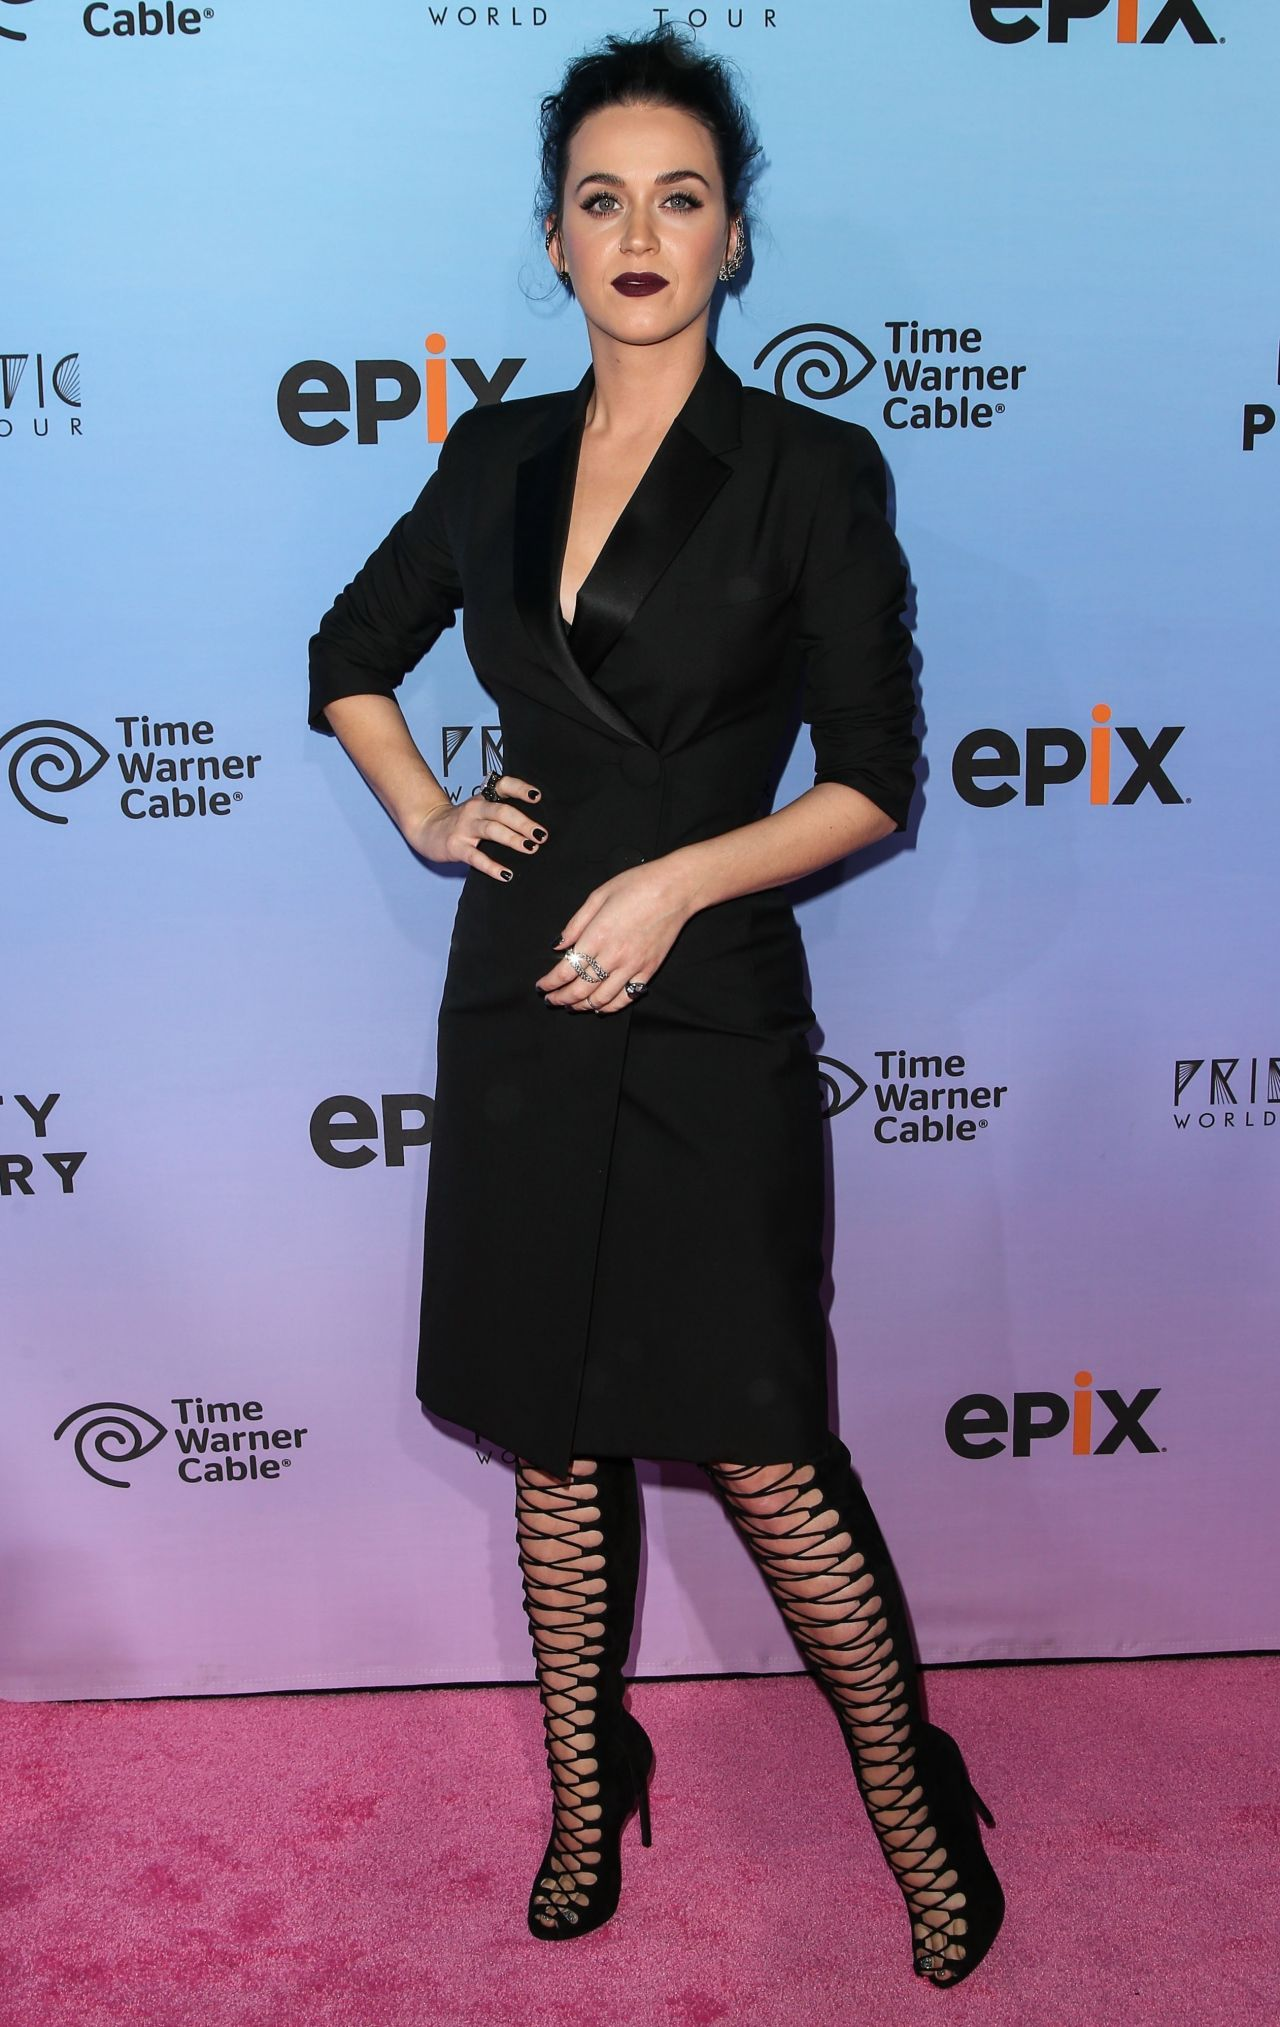 Katy Perry - 2015 Celebrity Photos